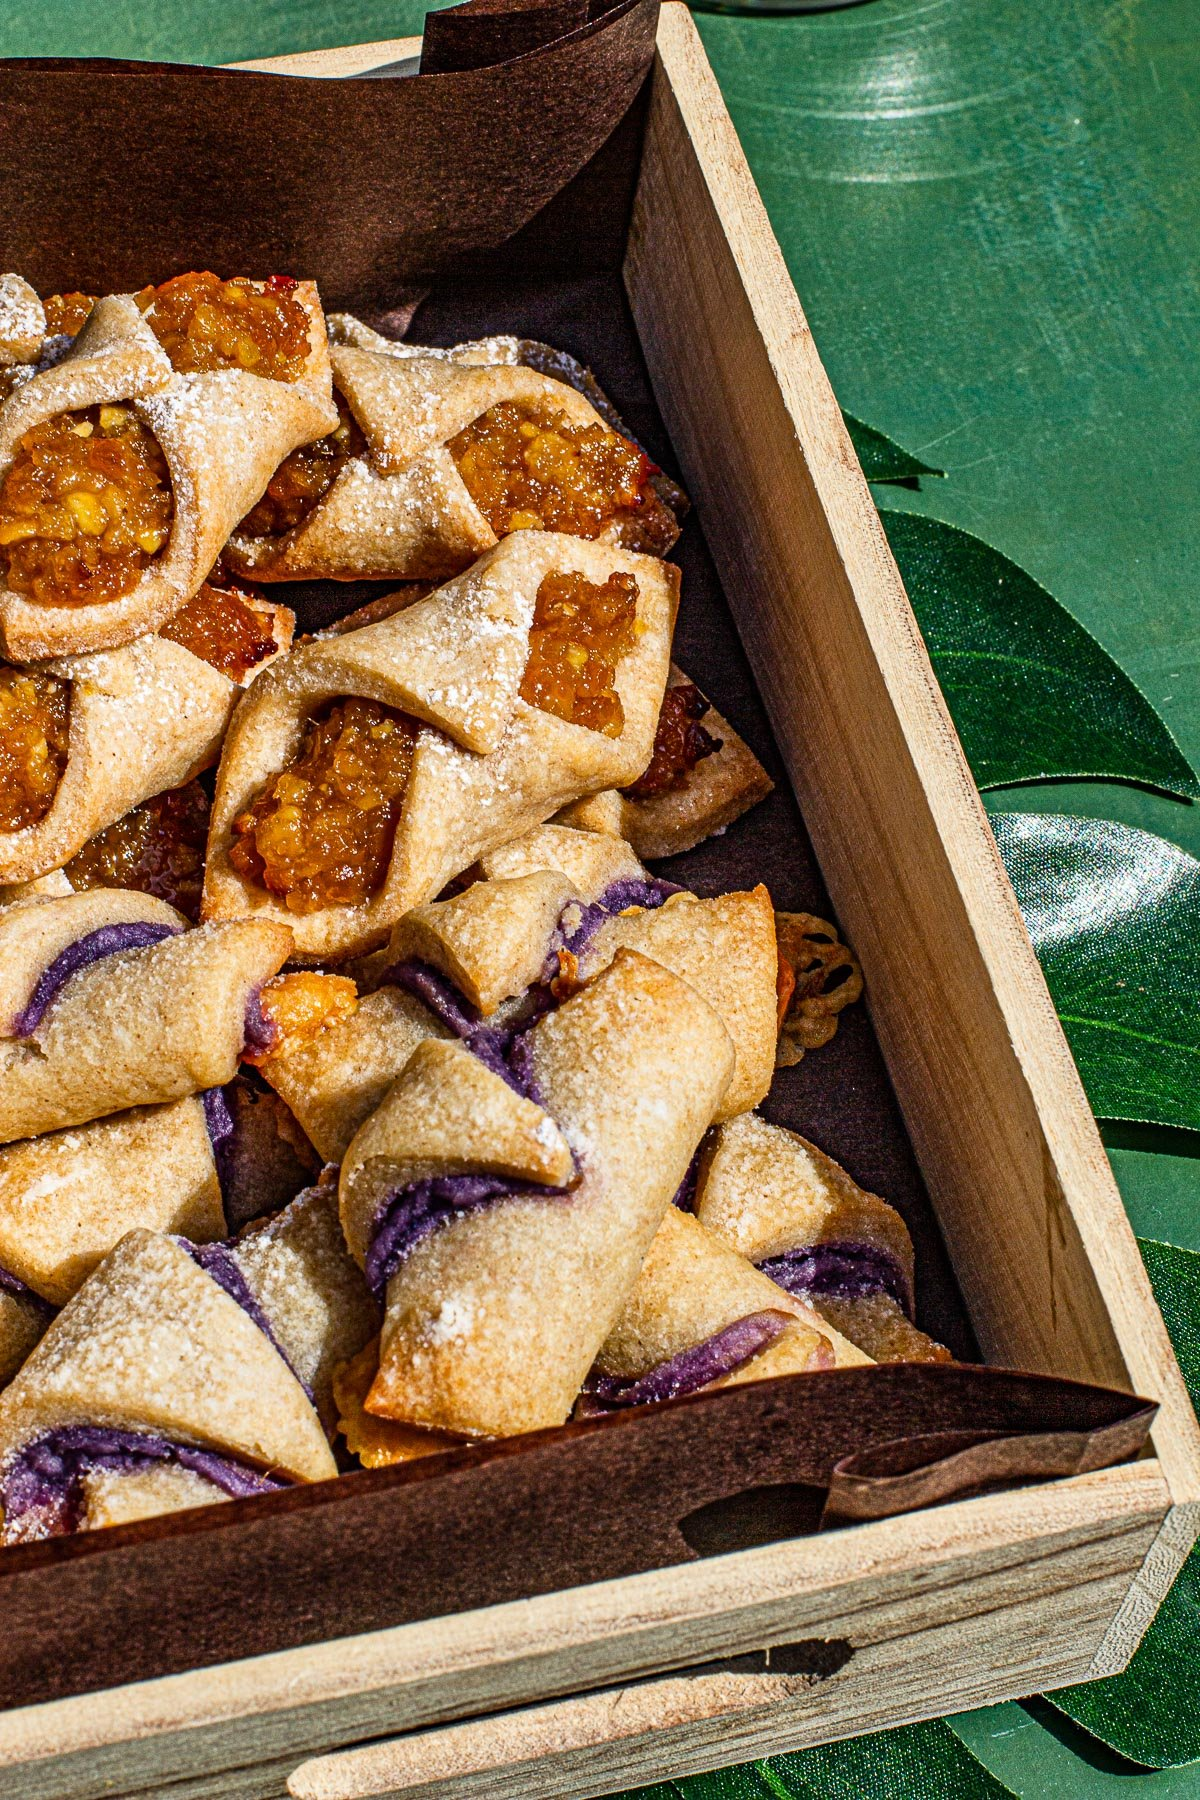 Filipino Flavored Polish Kolaczki Cookies in a wooden box